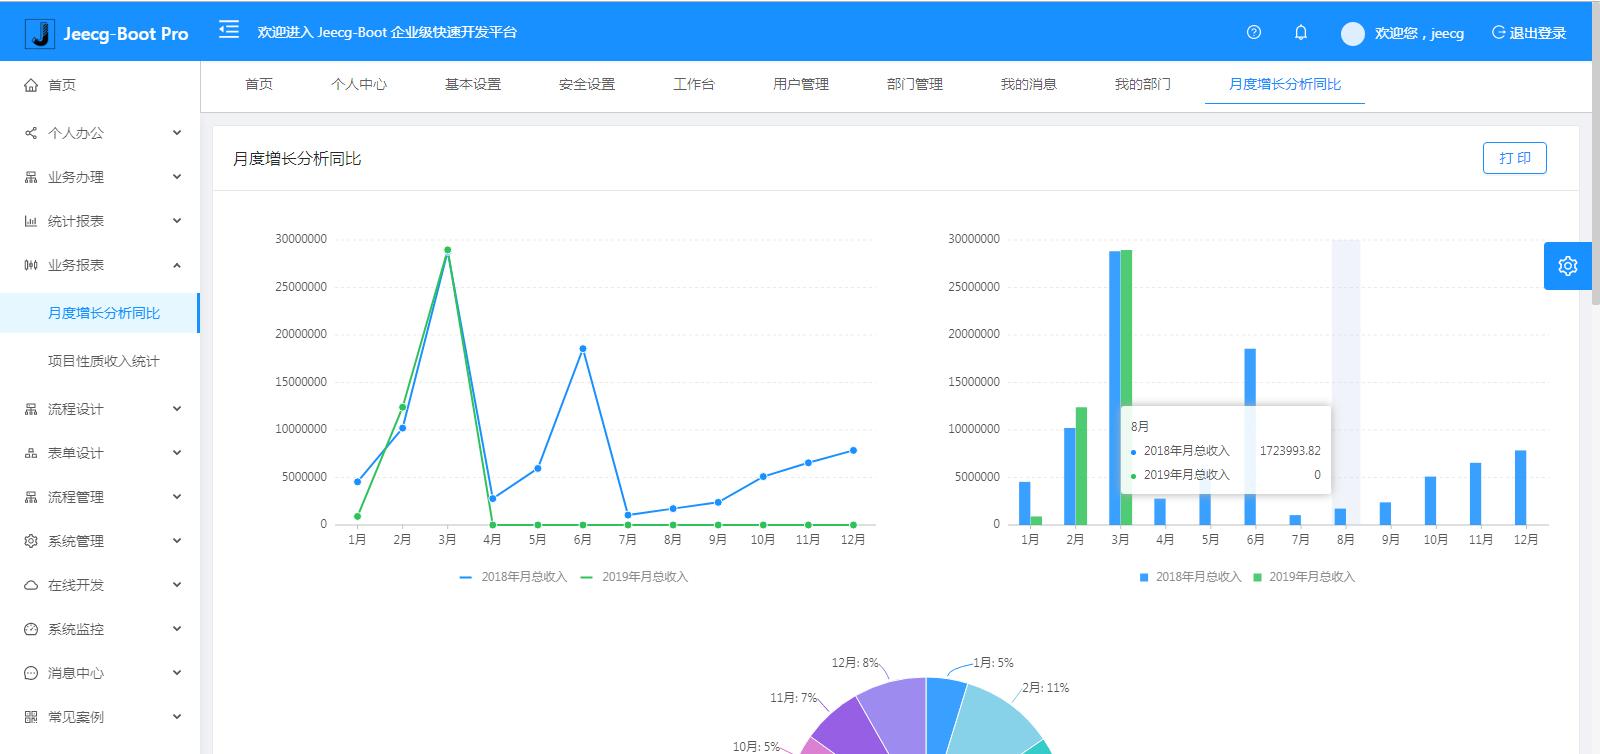 JeecgBoot 2.4.3版本发布,企业级低代码平台(图11)